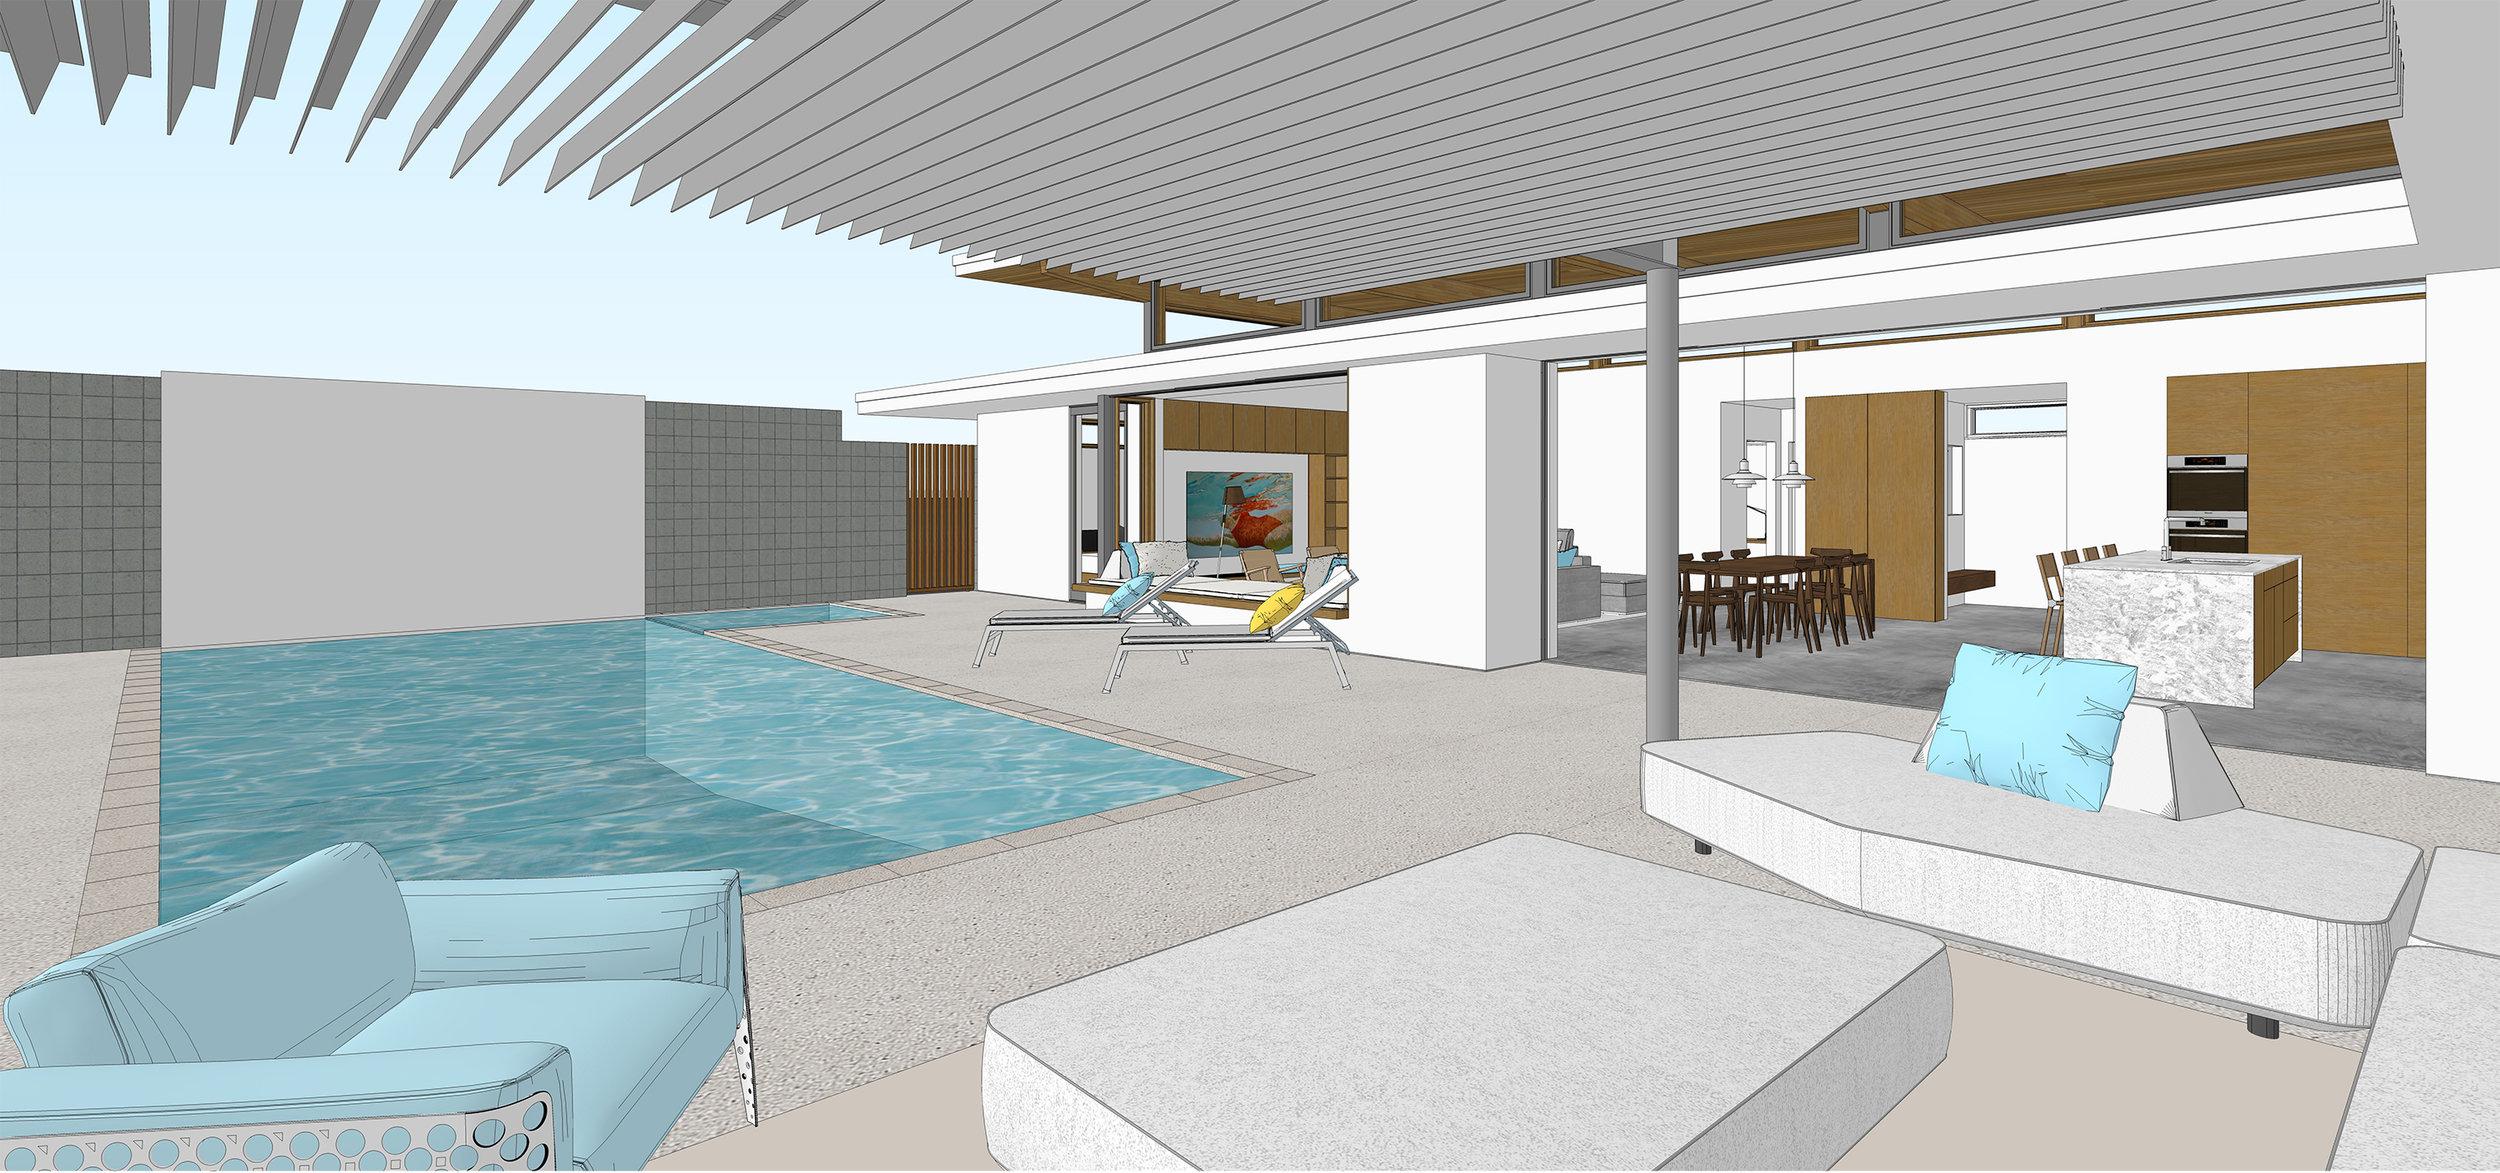 turkel_design_modern_prefab_home_axiomdeserthouse_schematic_design_backyard.jpg